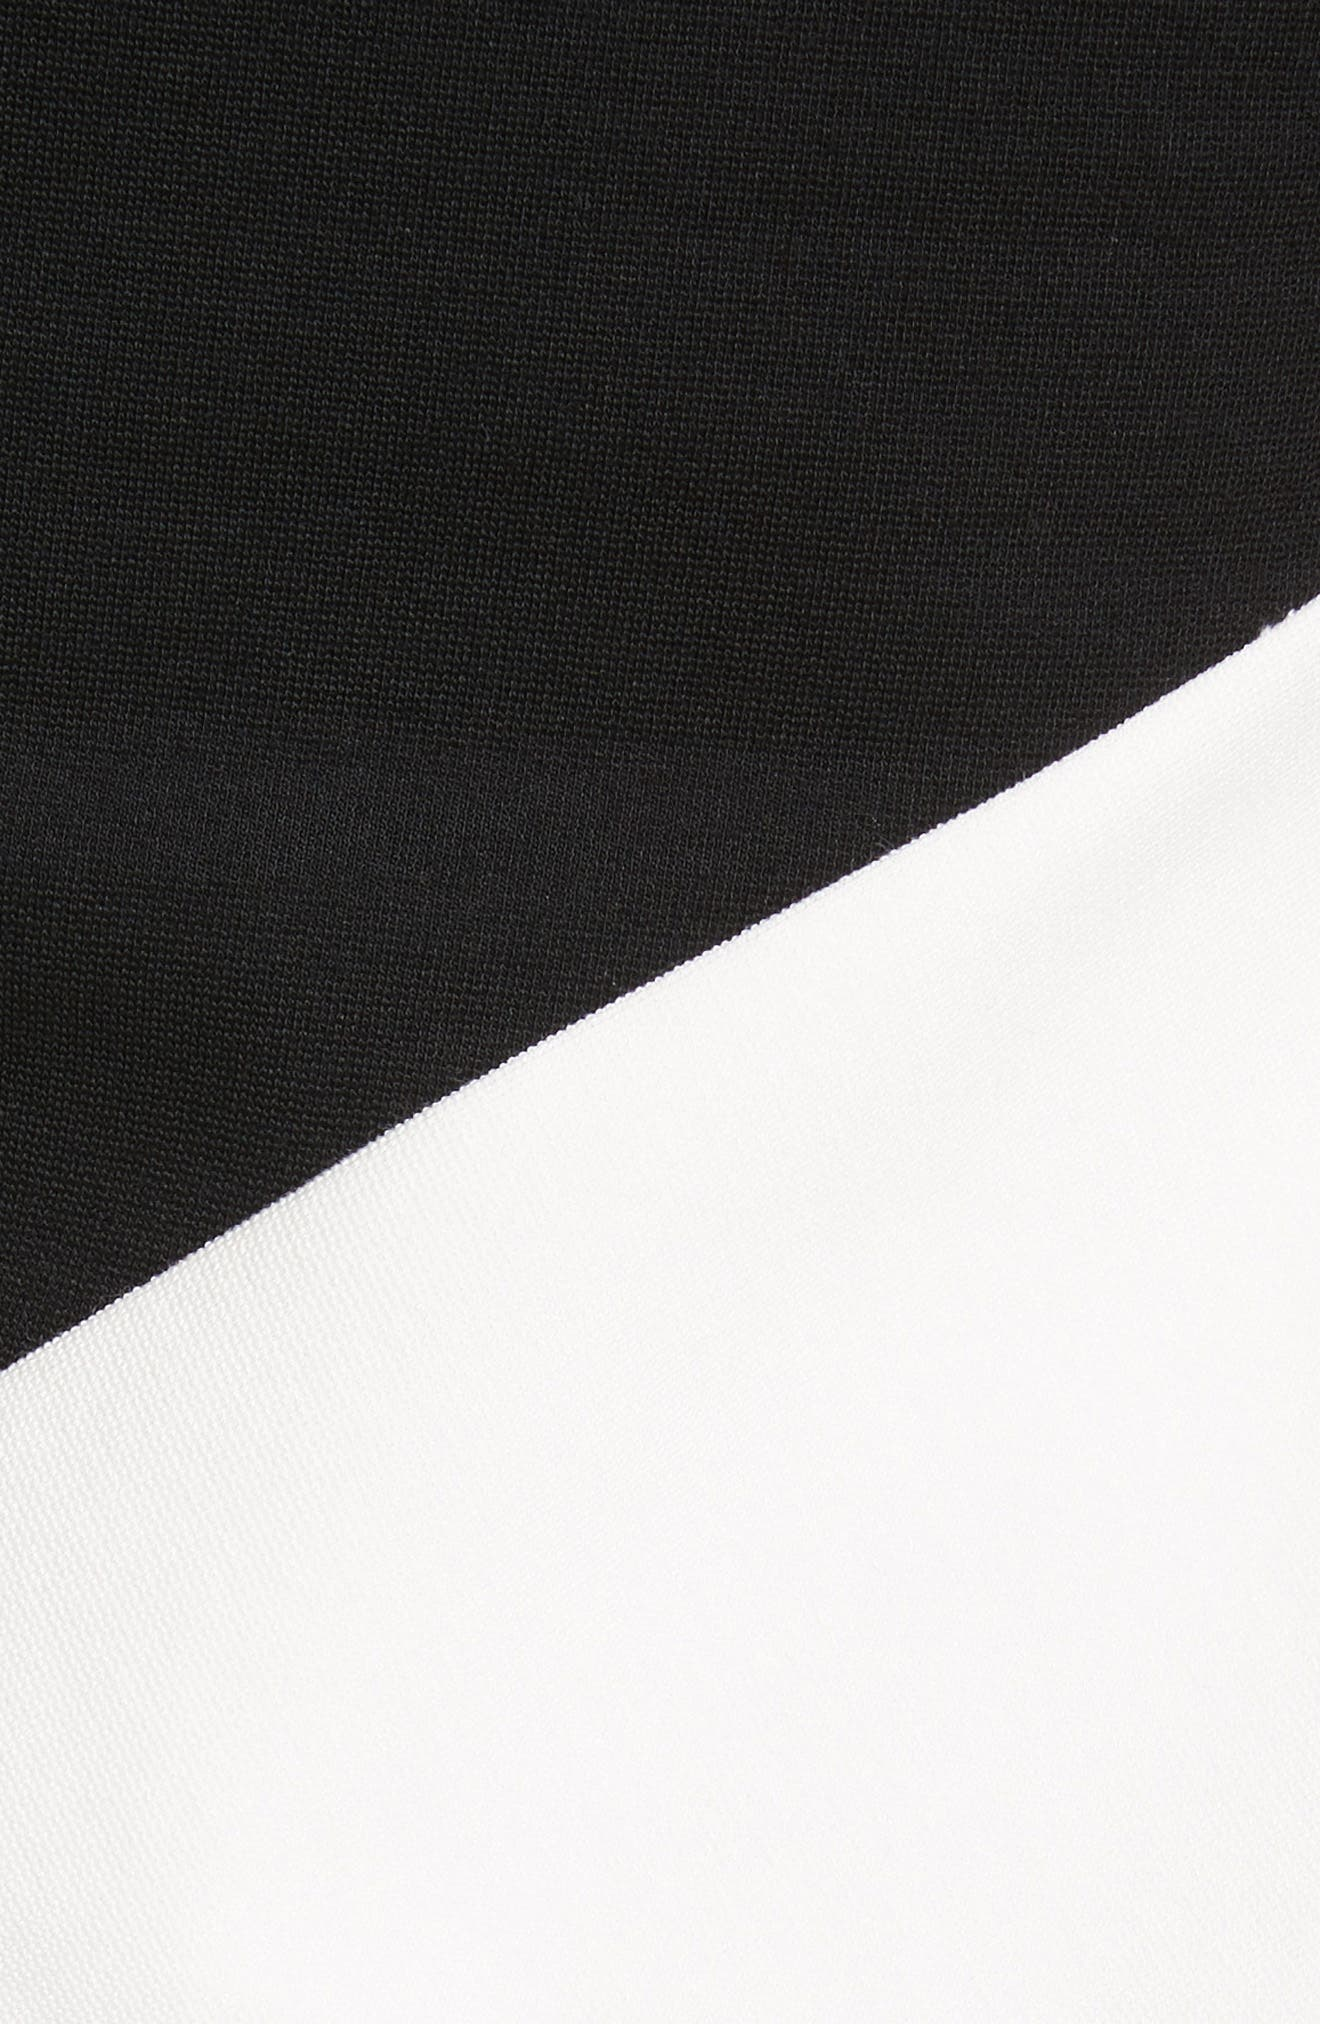 Asymmetrical Jersey Top,                             Alternate thumbnail 5, color,                             002